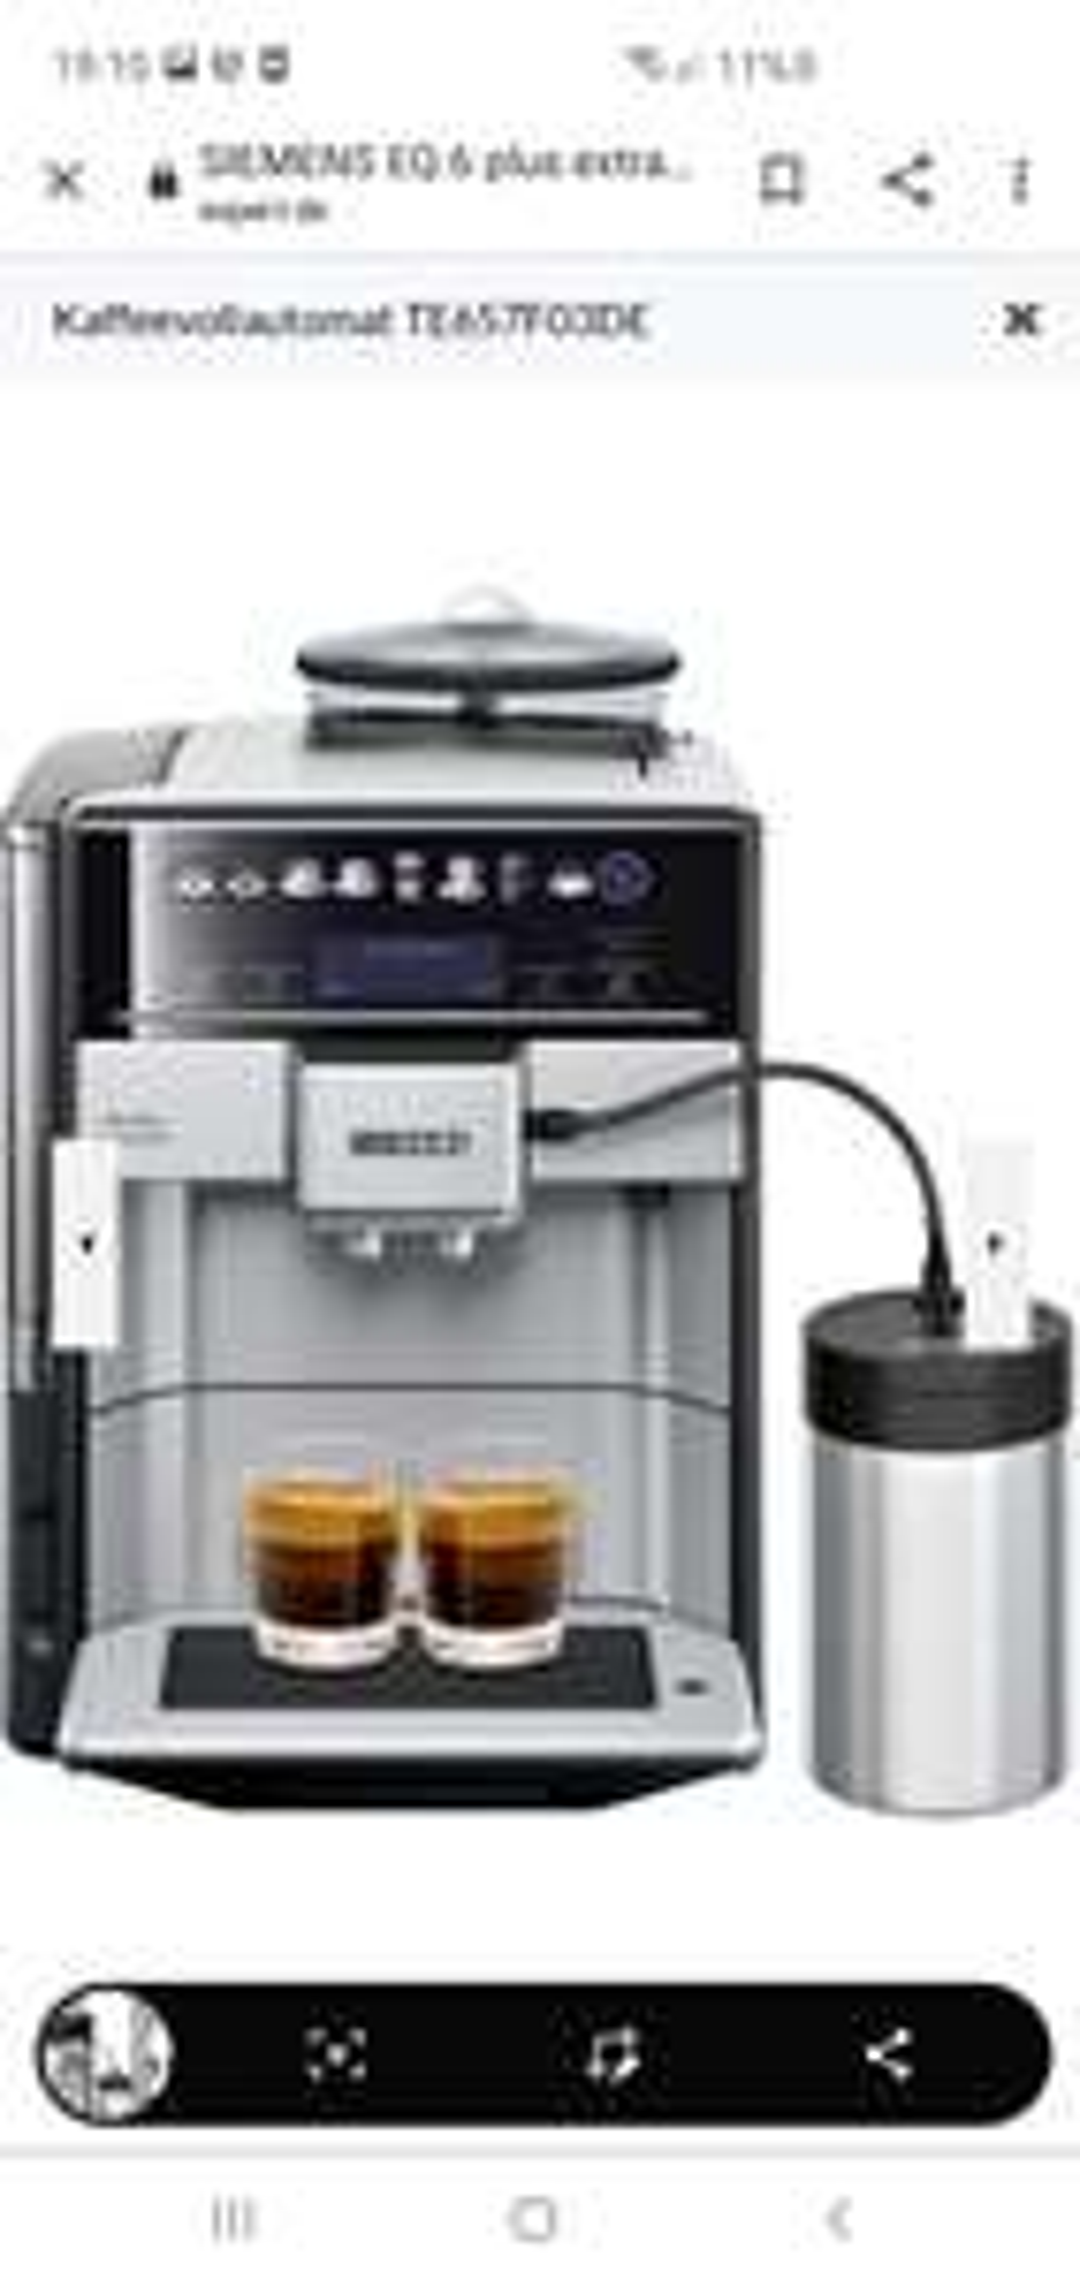 SIEMENS EQ.6 plus extraKlasse TE657F03DE Edelstahl, schwarz Kaffeevollautomat (expert Wangen)